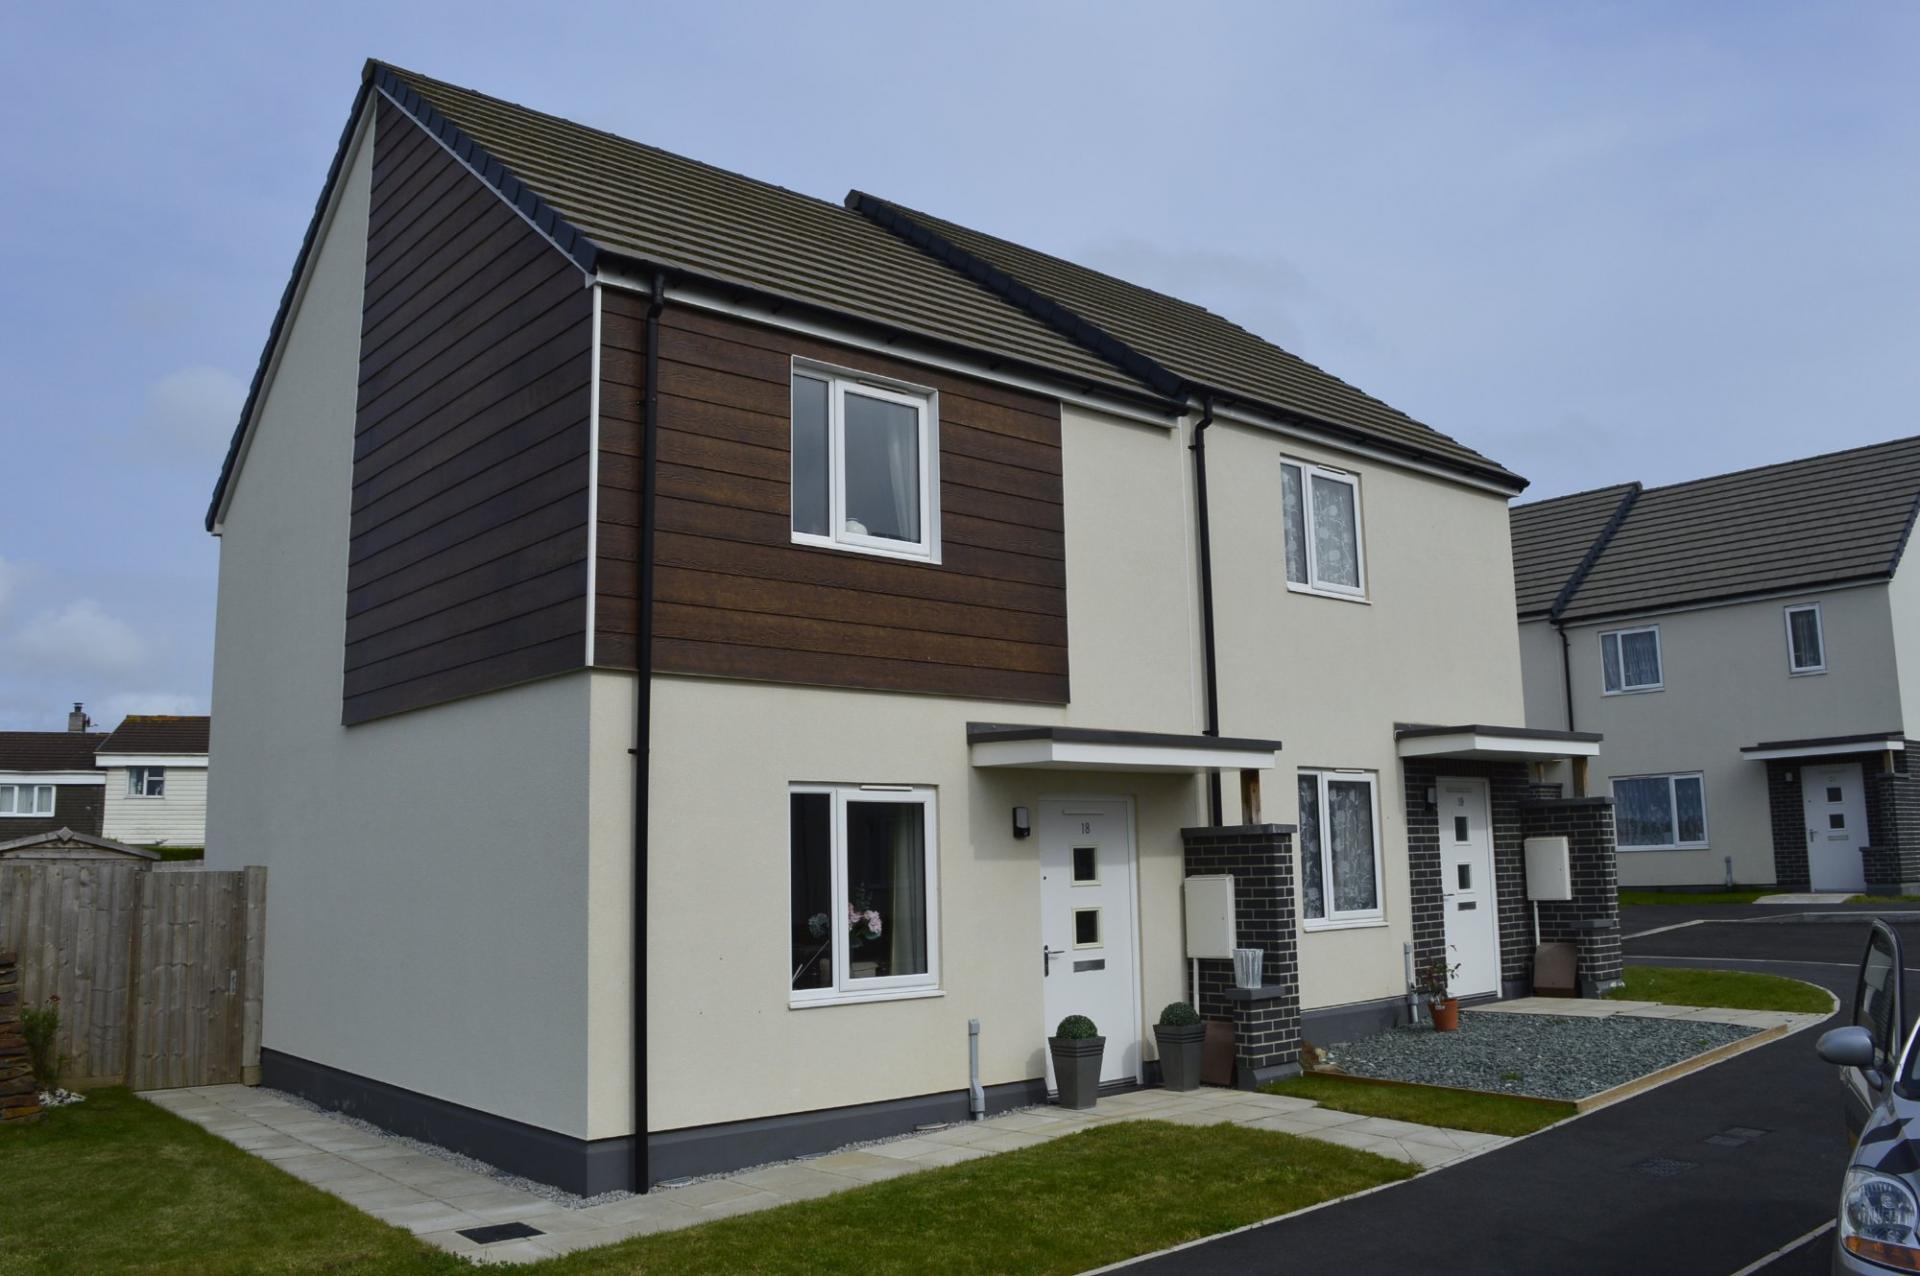 Property For Sale In Camborne Redruth Area